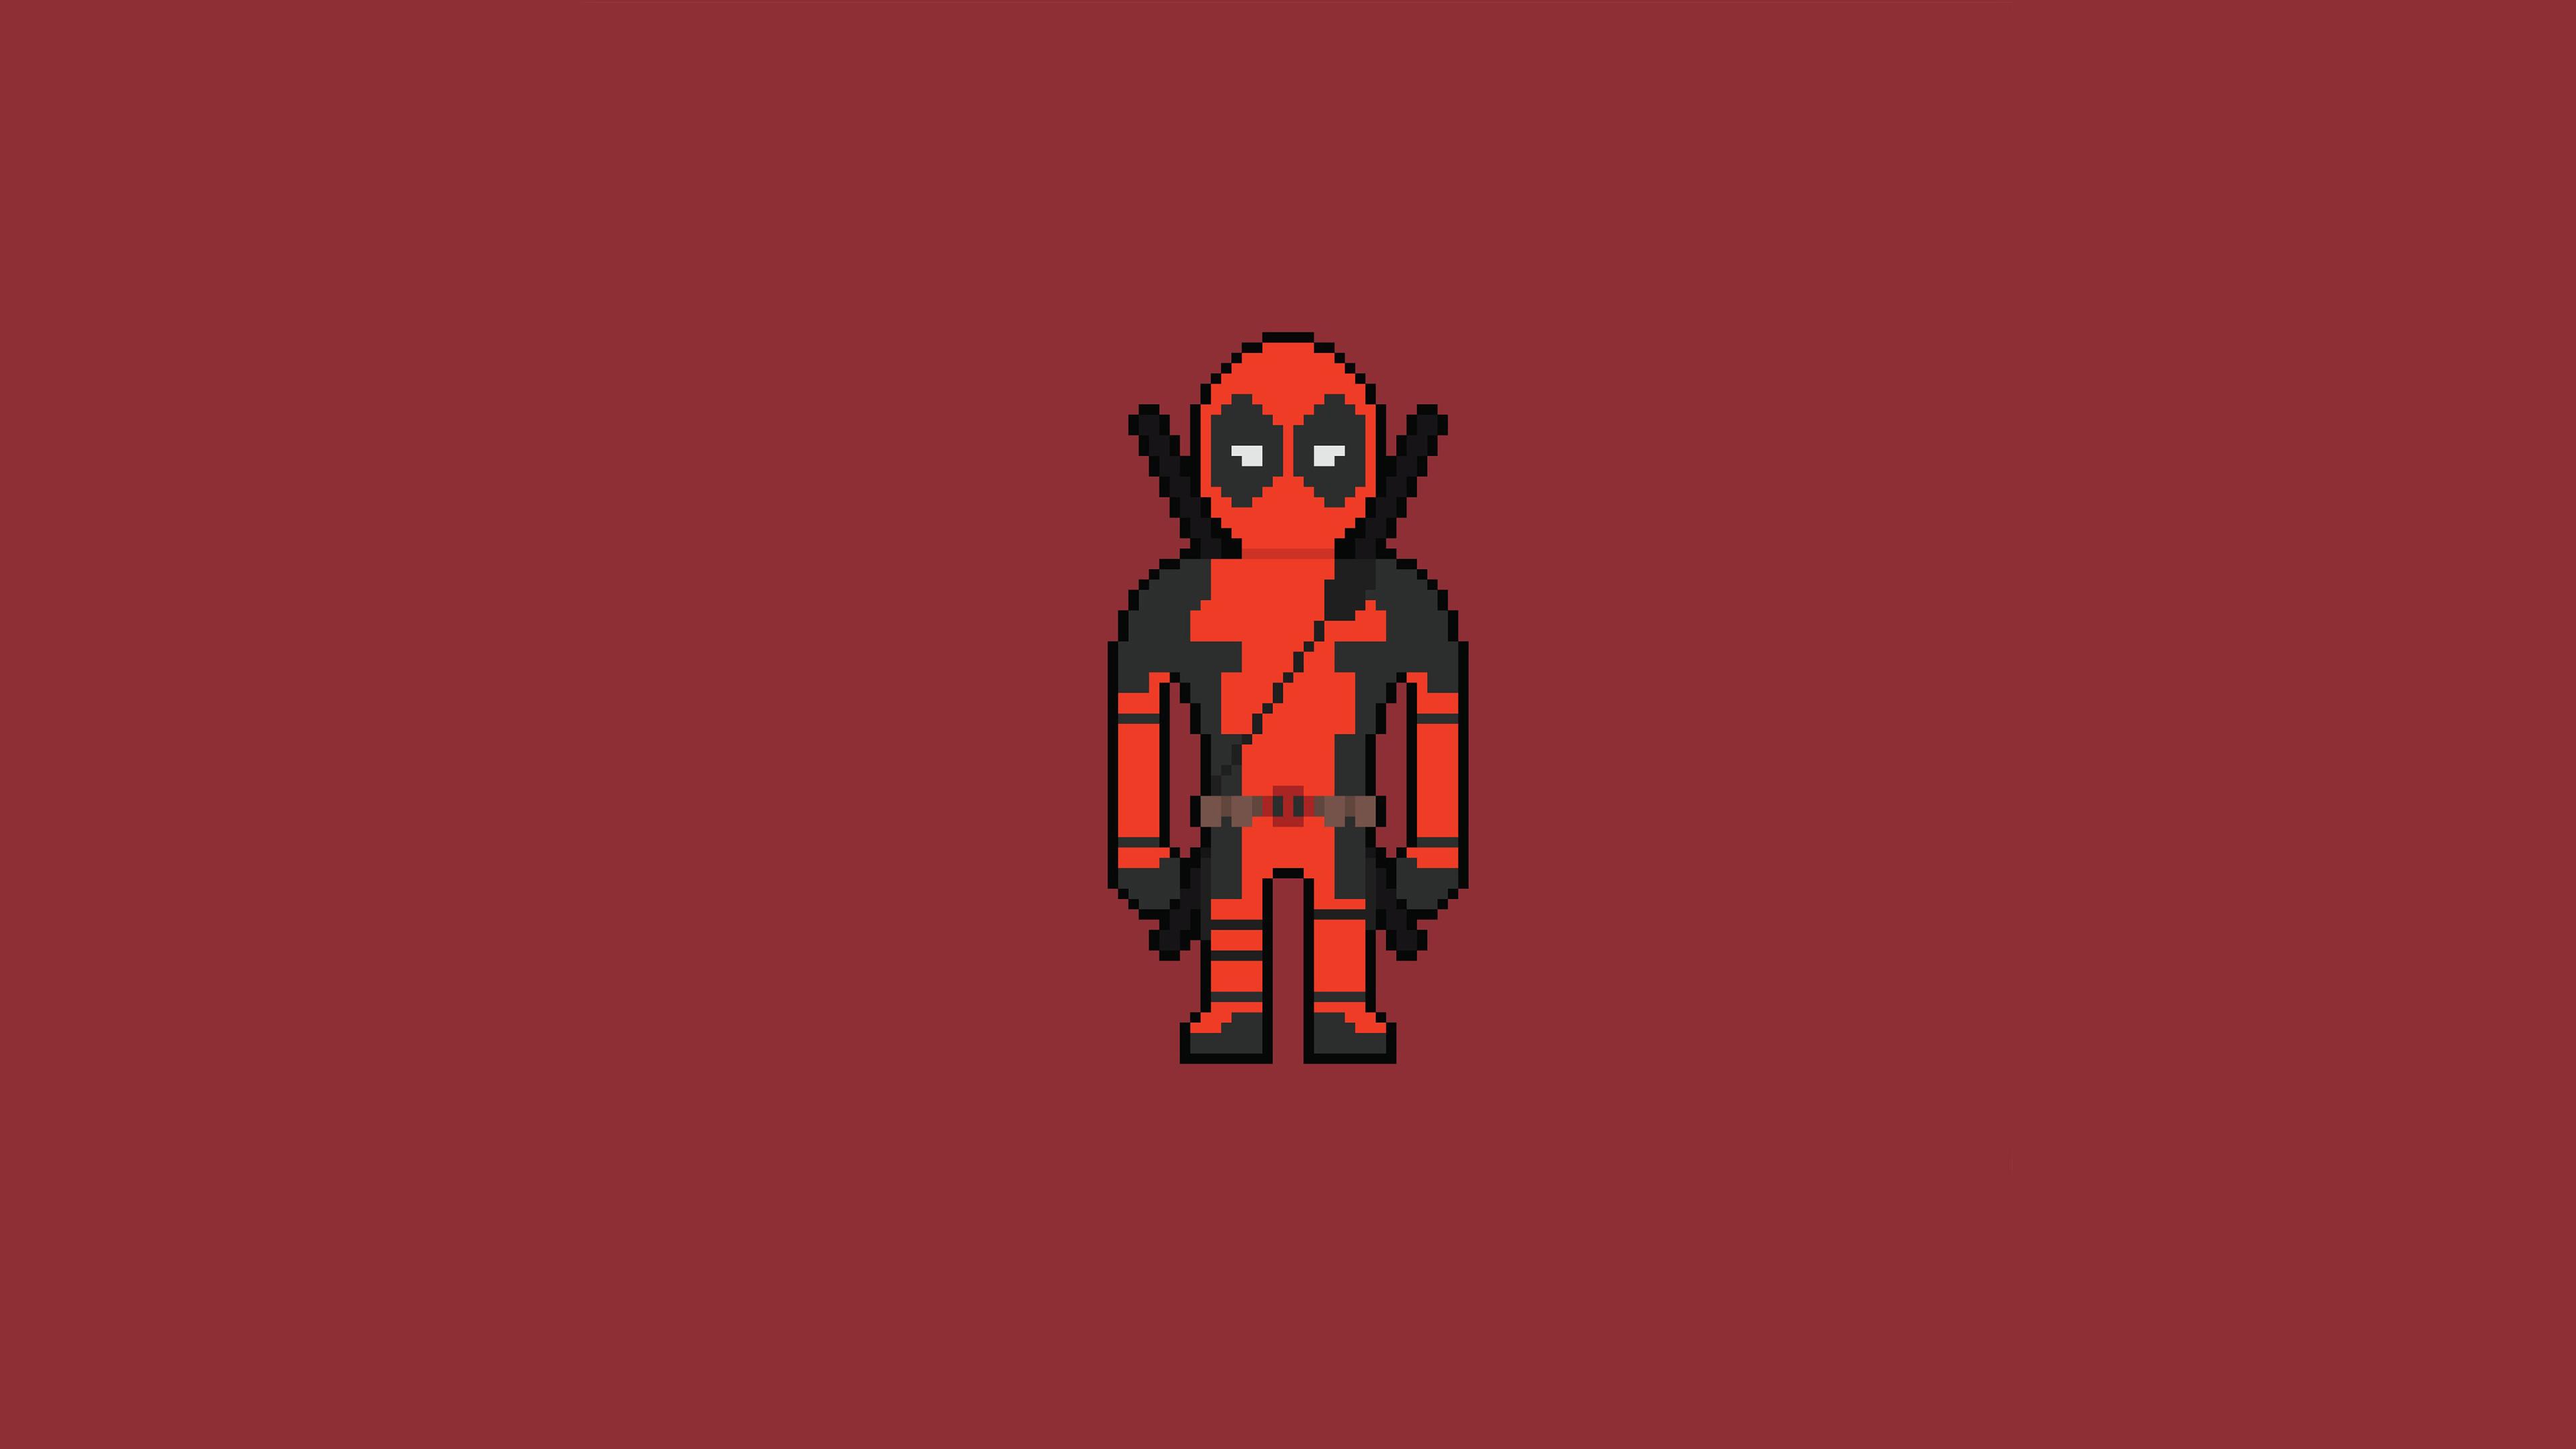 Pixel Deadpool Art Hd Superheroes 4k Wallpapers Images